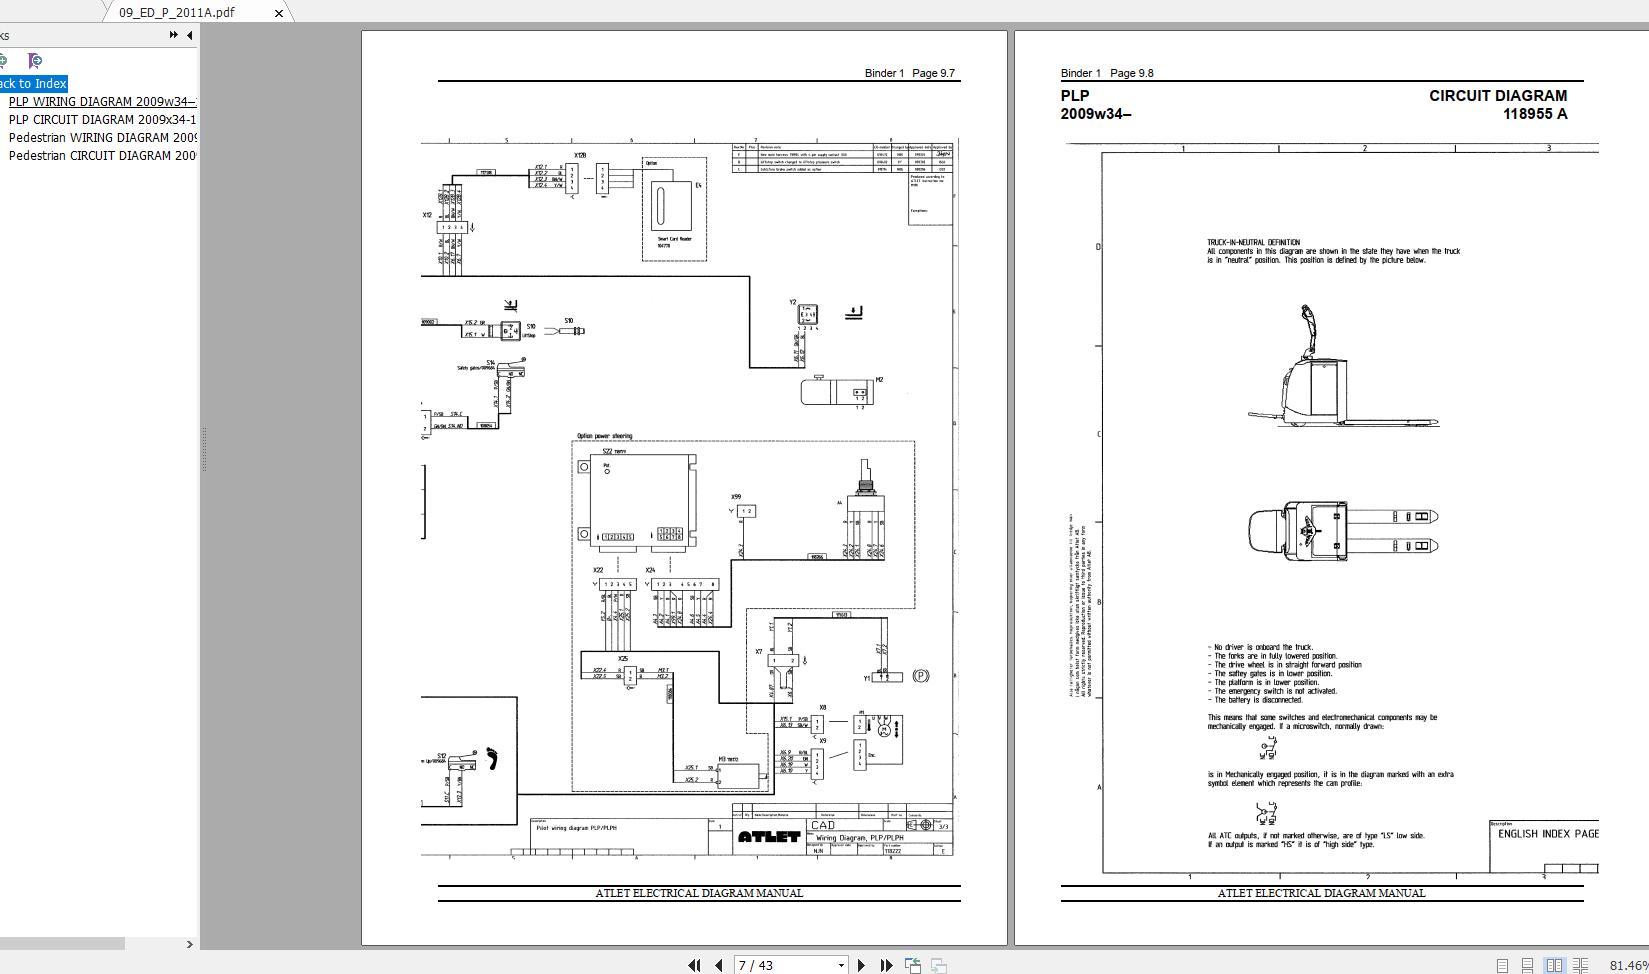 nissan forklift p series_2011a electrical diagrams | auto repair manual  forum - heavy equipment forums - download repair & workshop manual  autorepairmanuals.ws